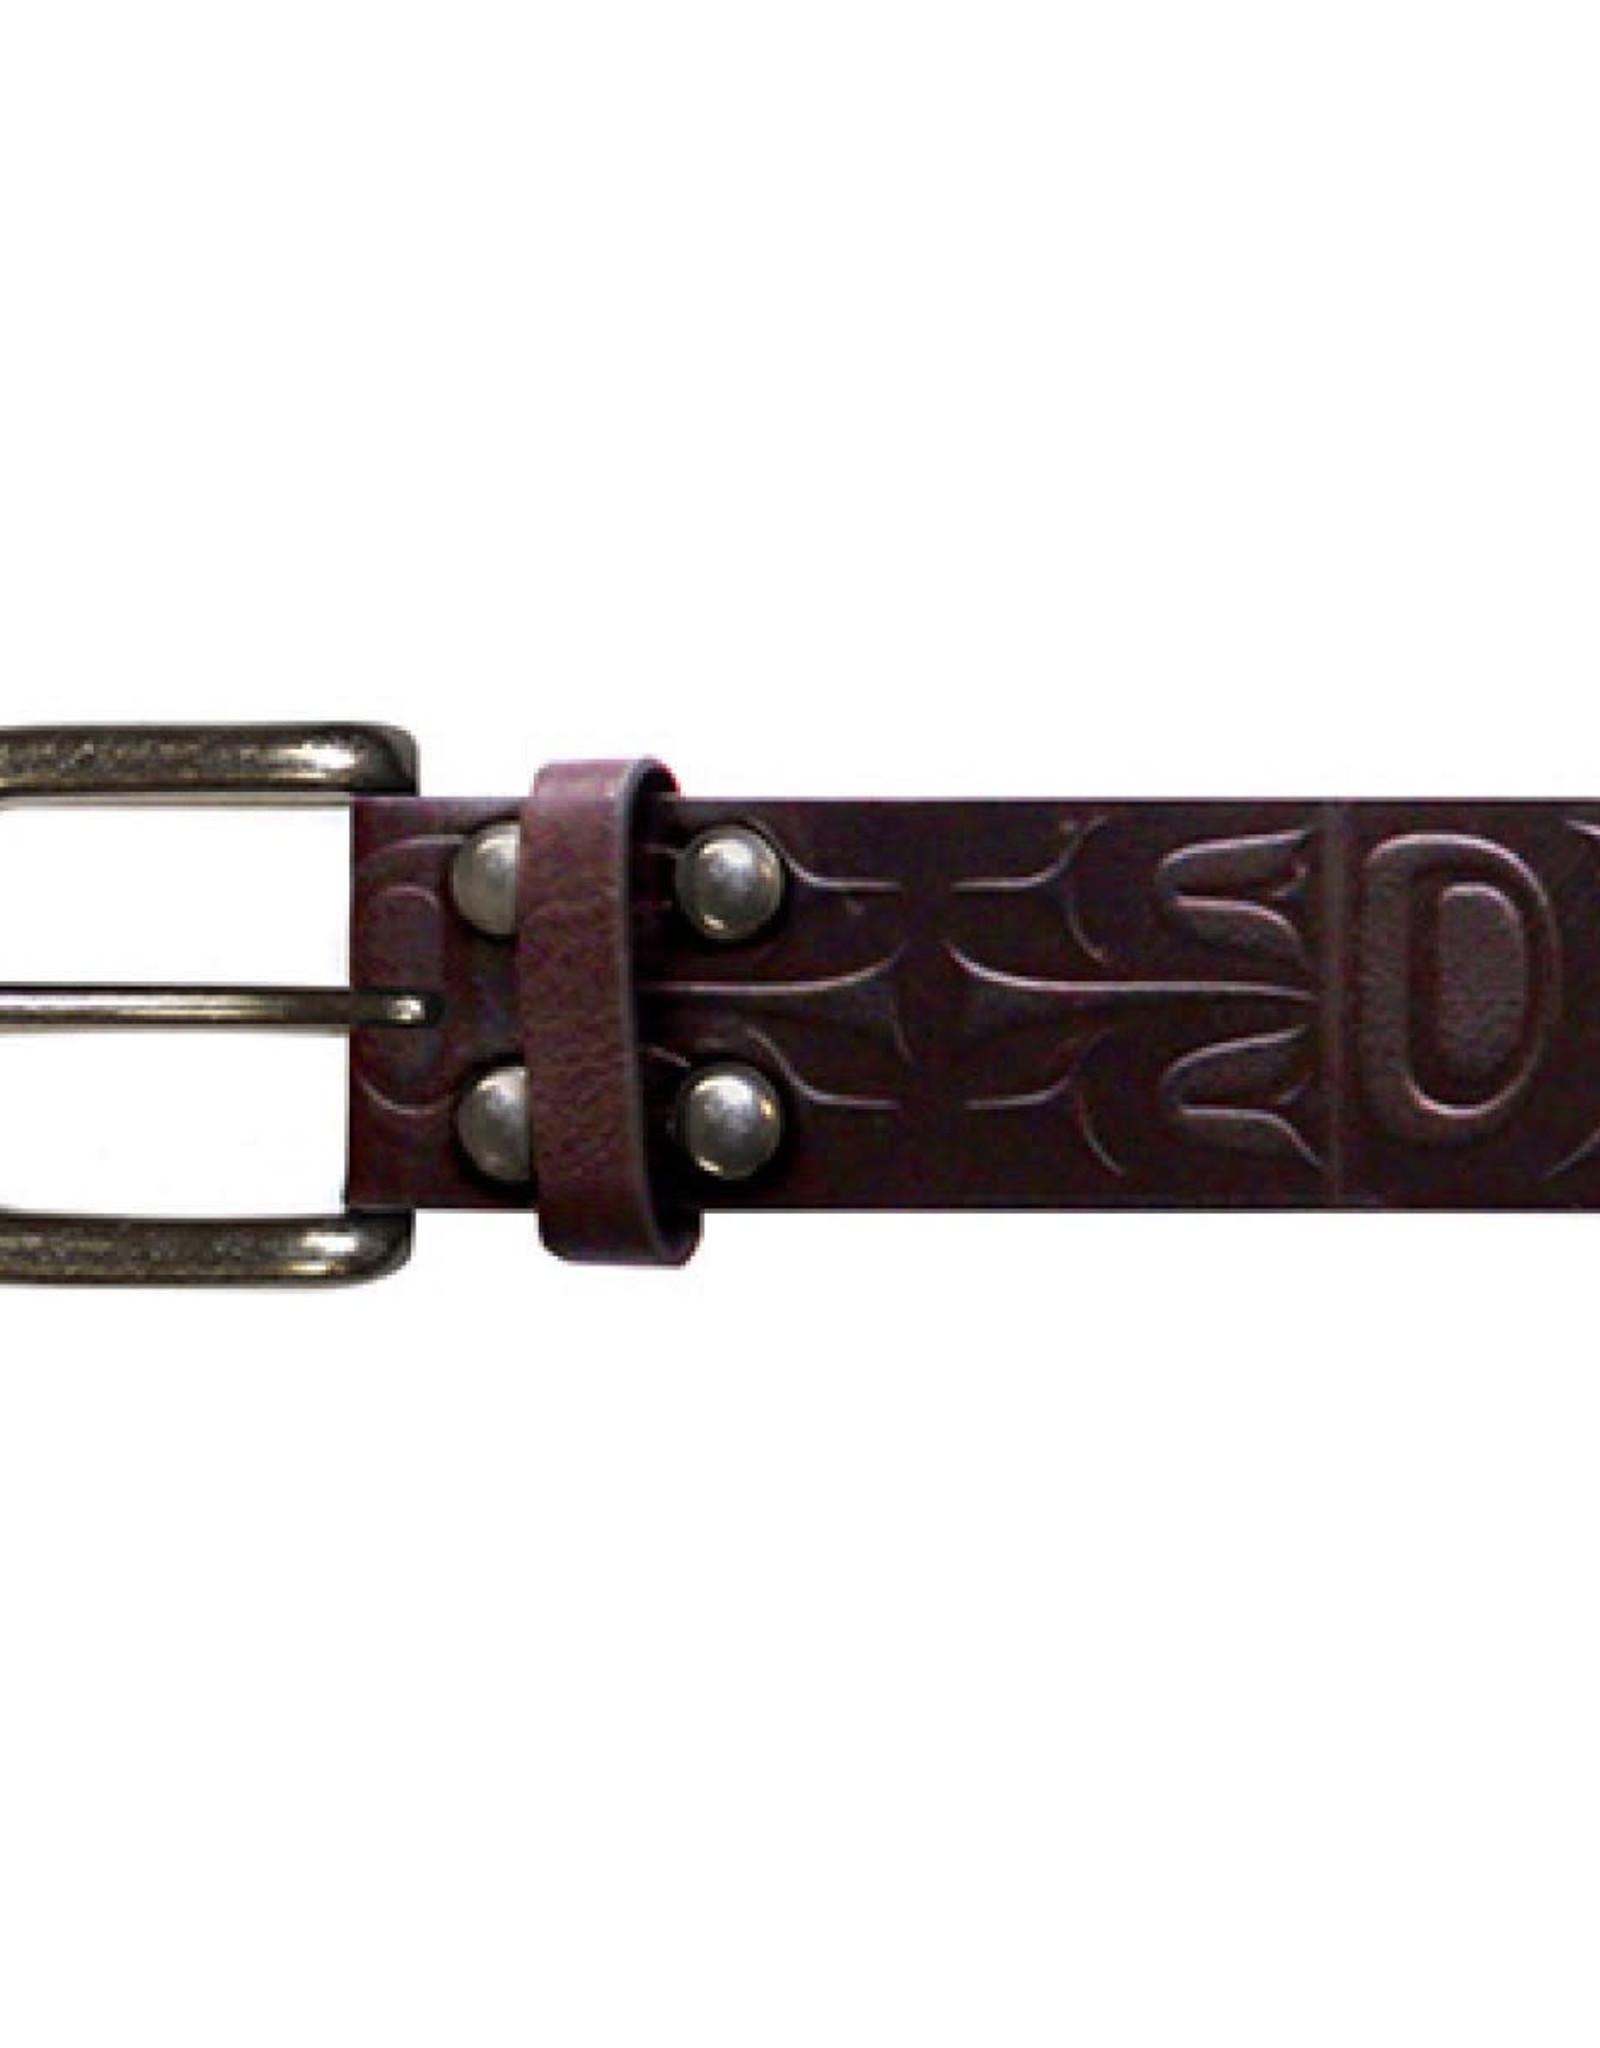 Leather Belt- Eagle by Corey Bulpitt